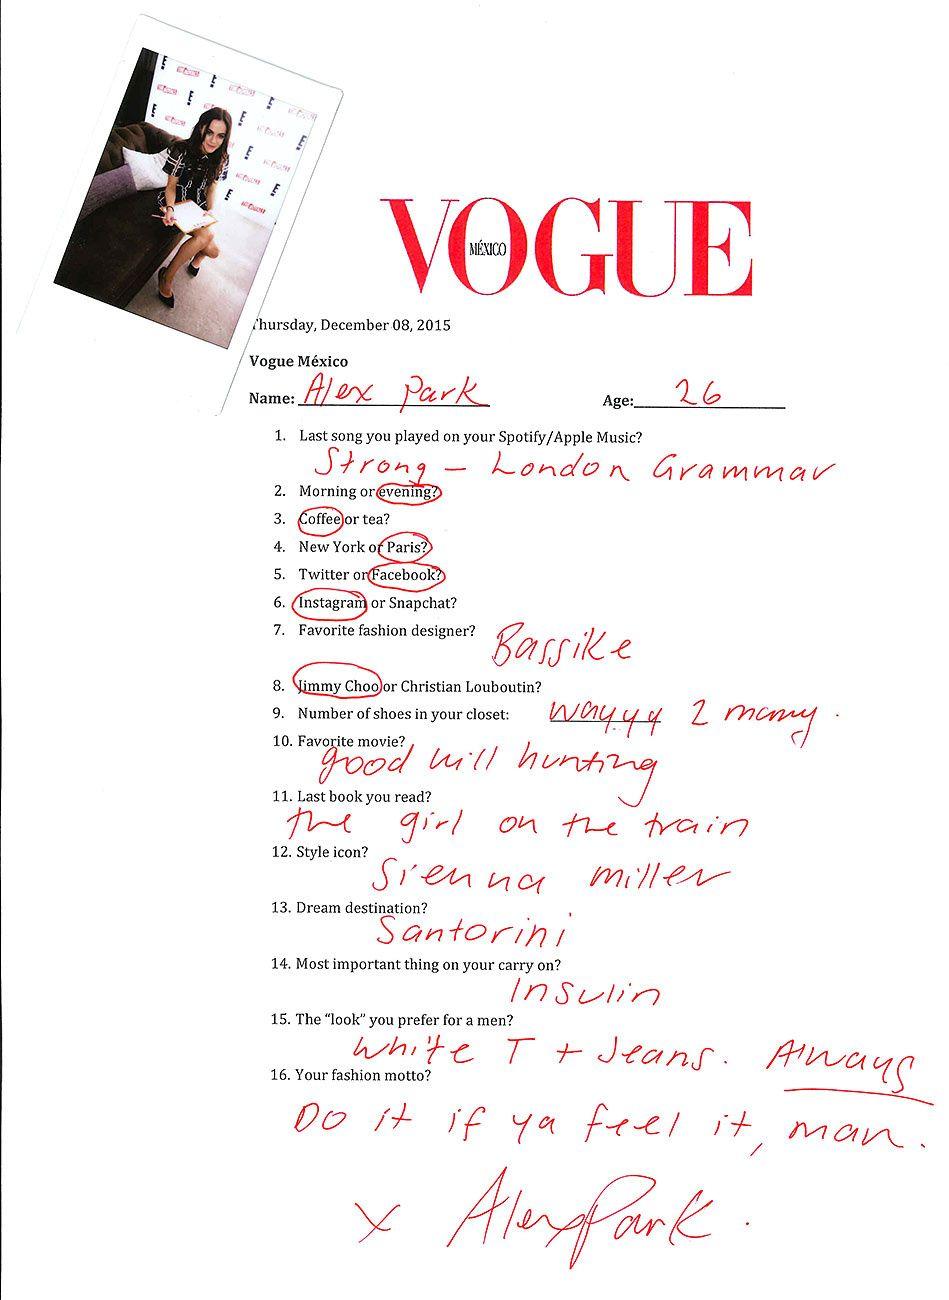 Alexandra Park en #VogueConfidential